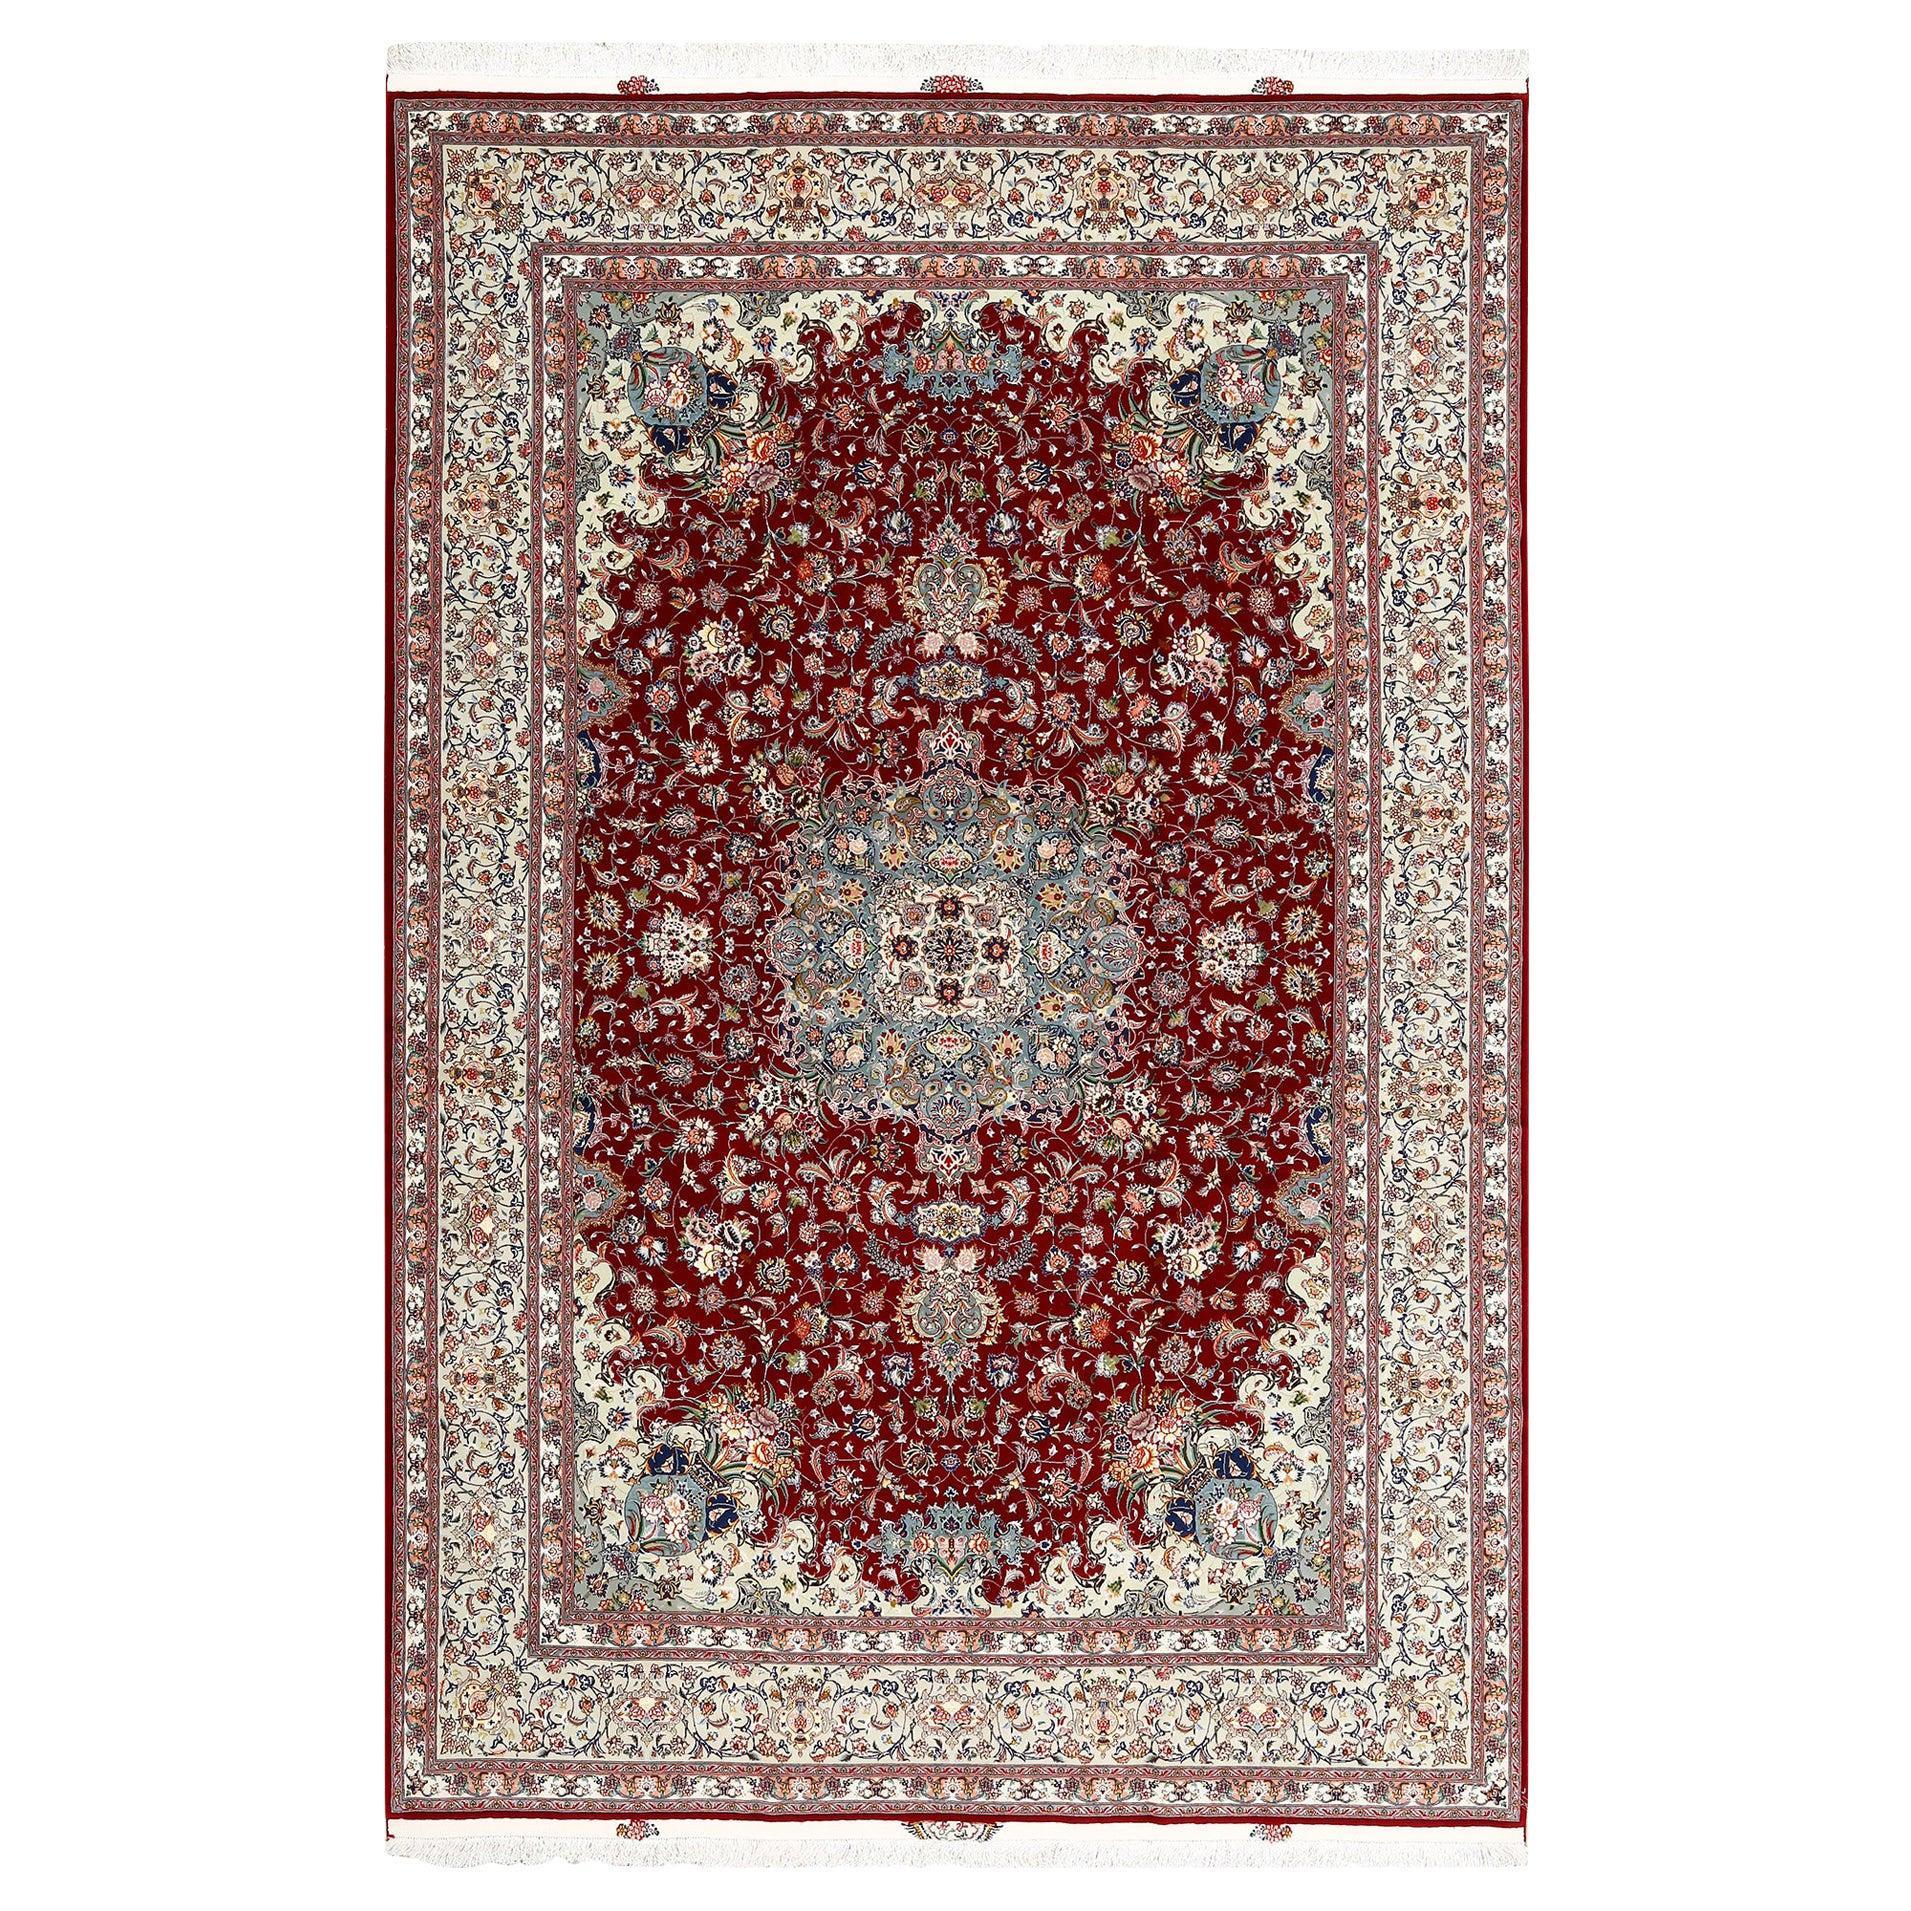 Fine Floral Vintage Tabriz Persian Rug. Size: 8 ft 1 in x 12 ft 3 in